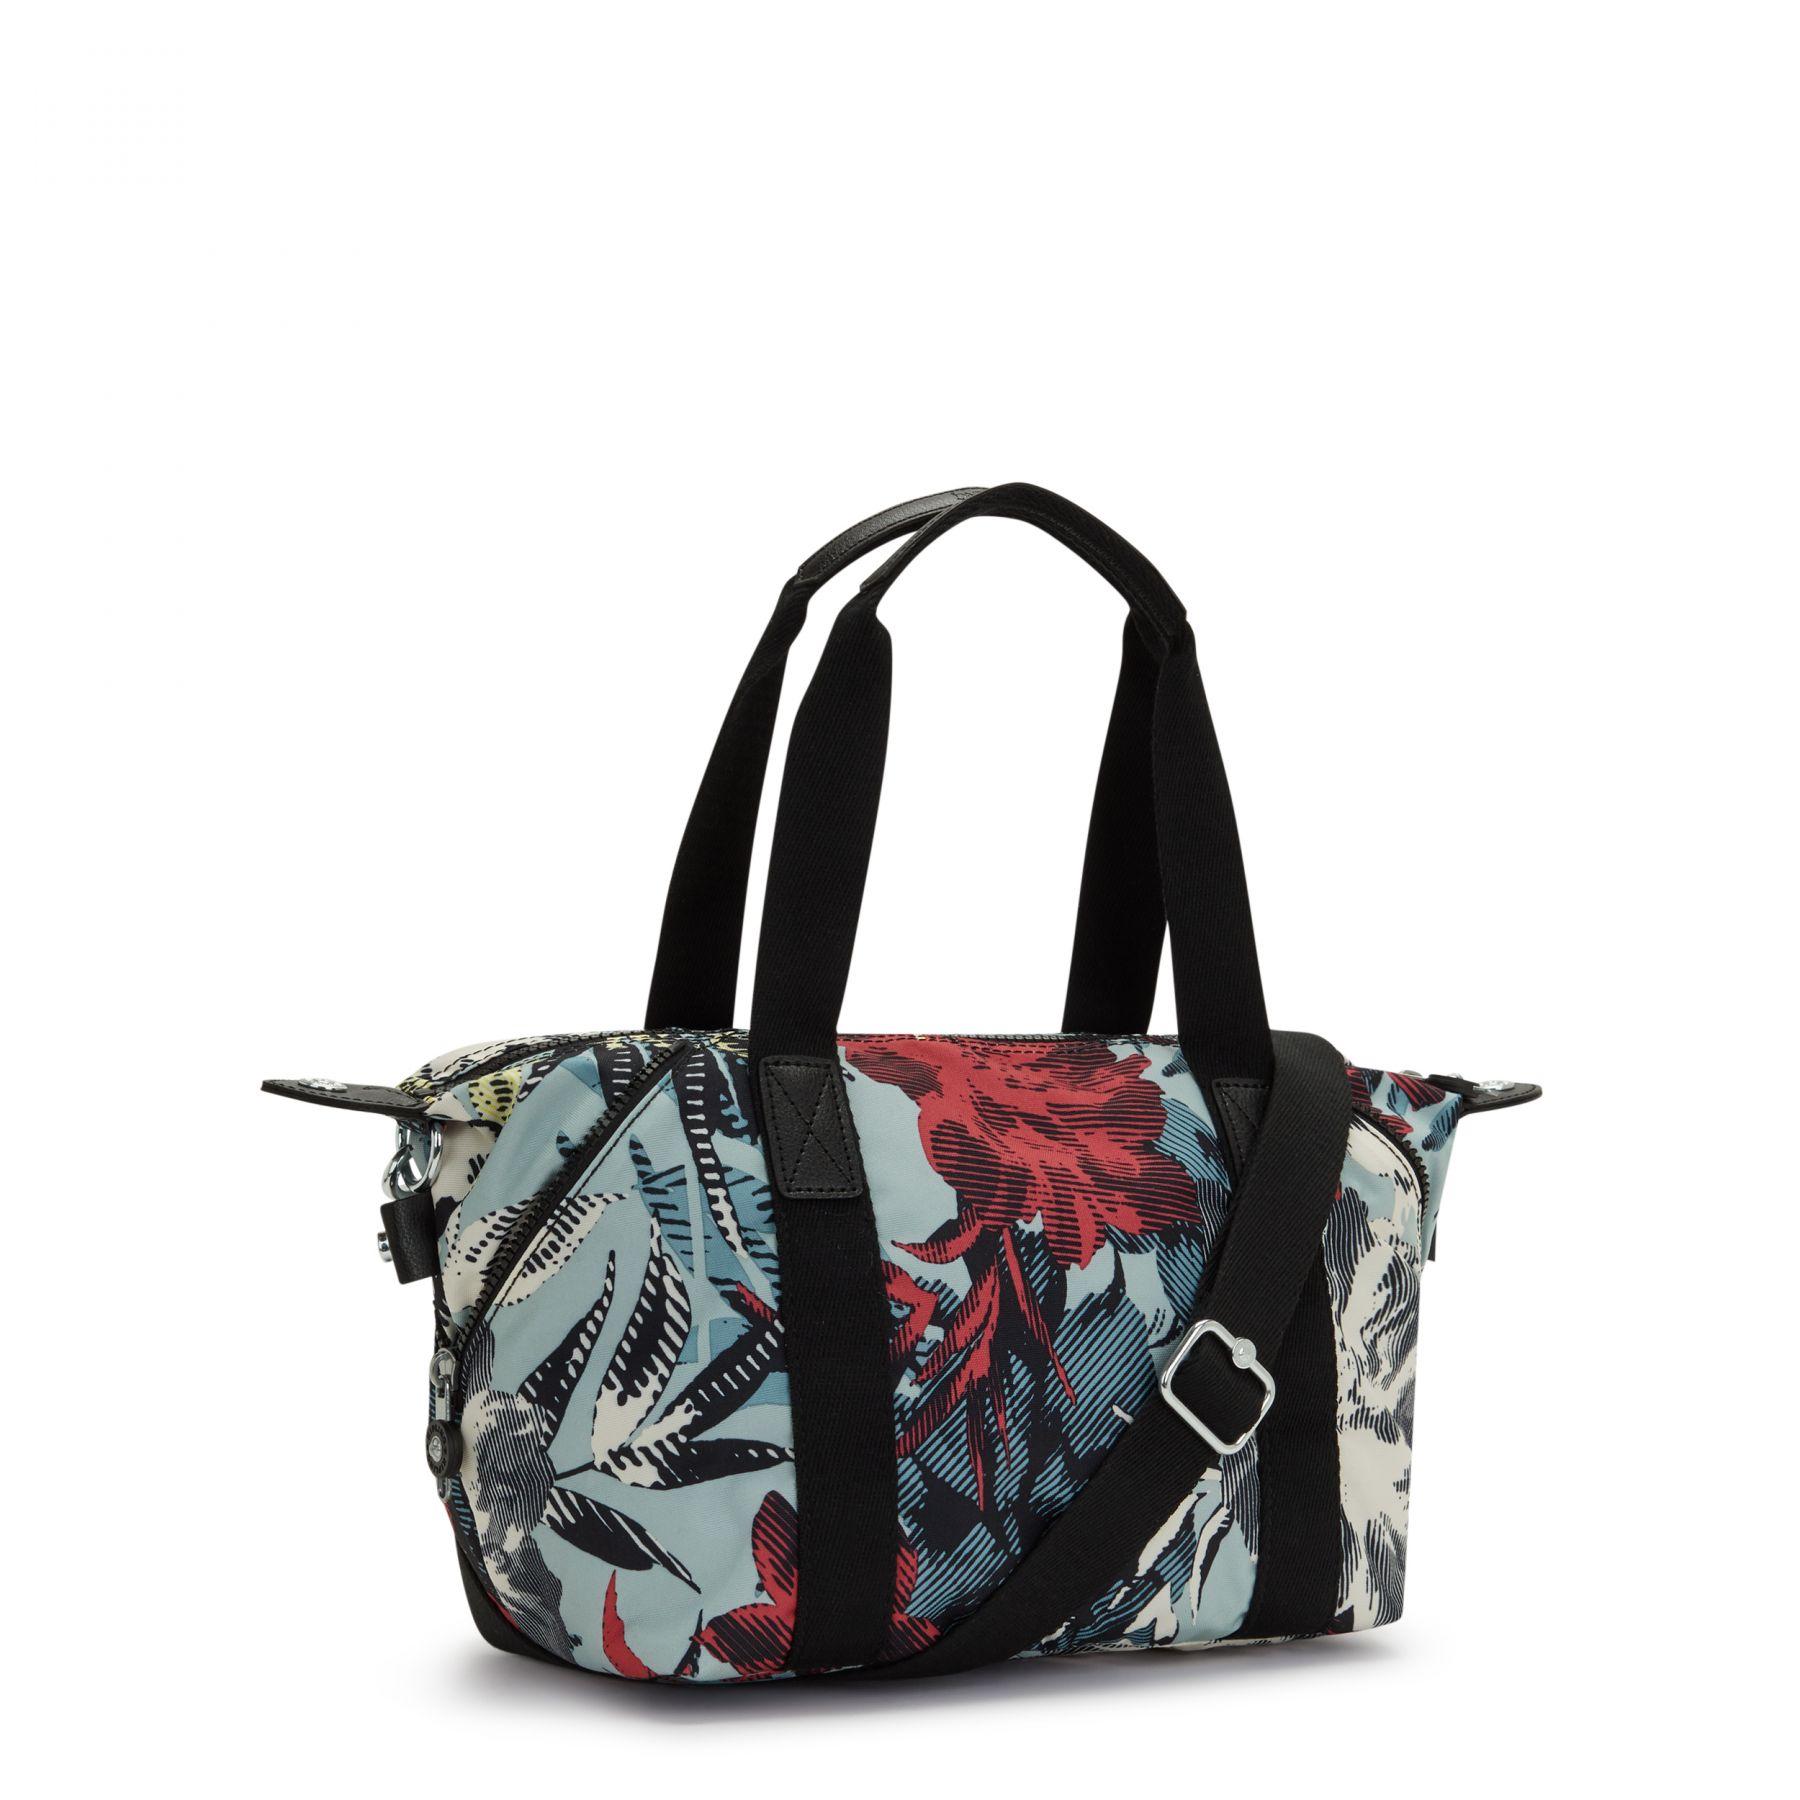 ART MINI BAGS by Kipling - Back view